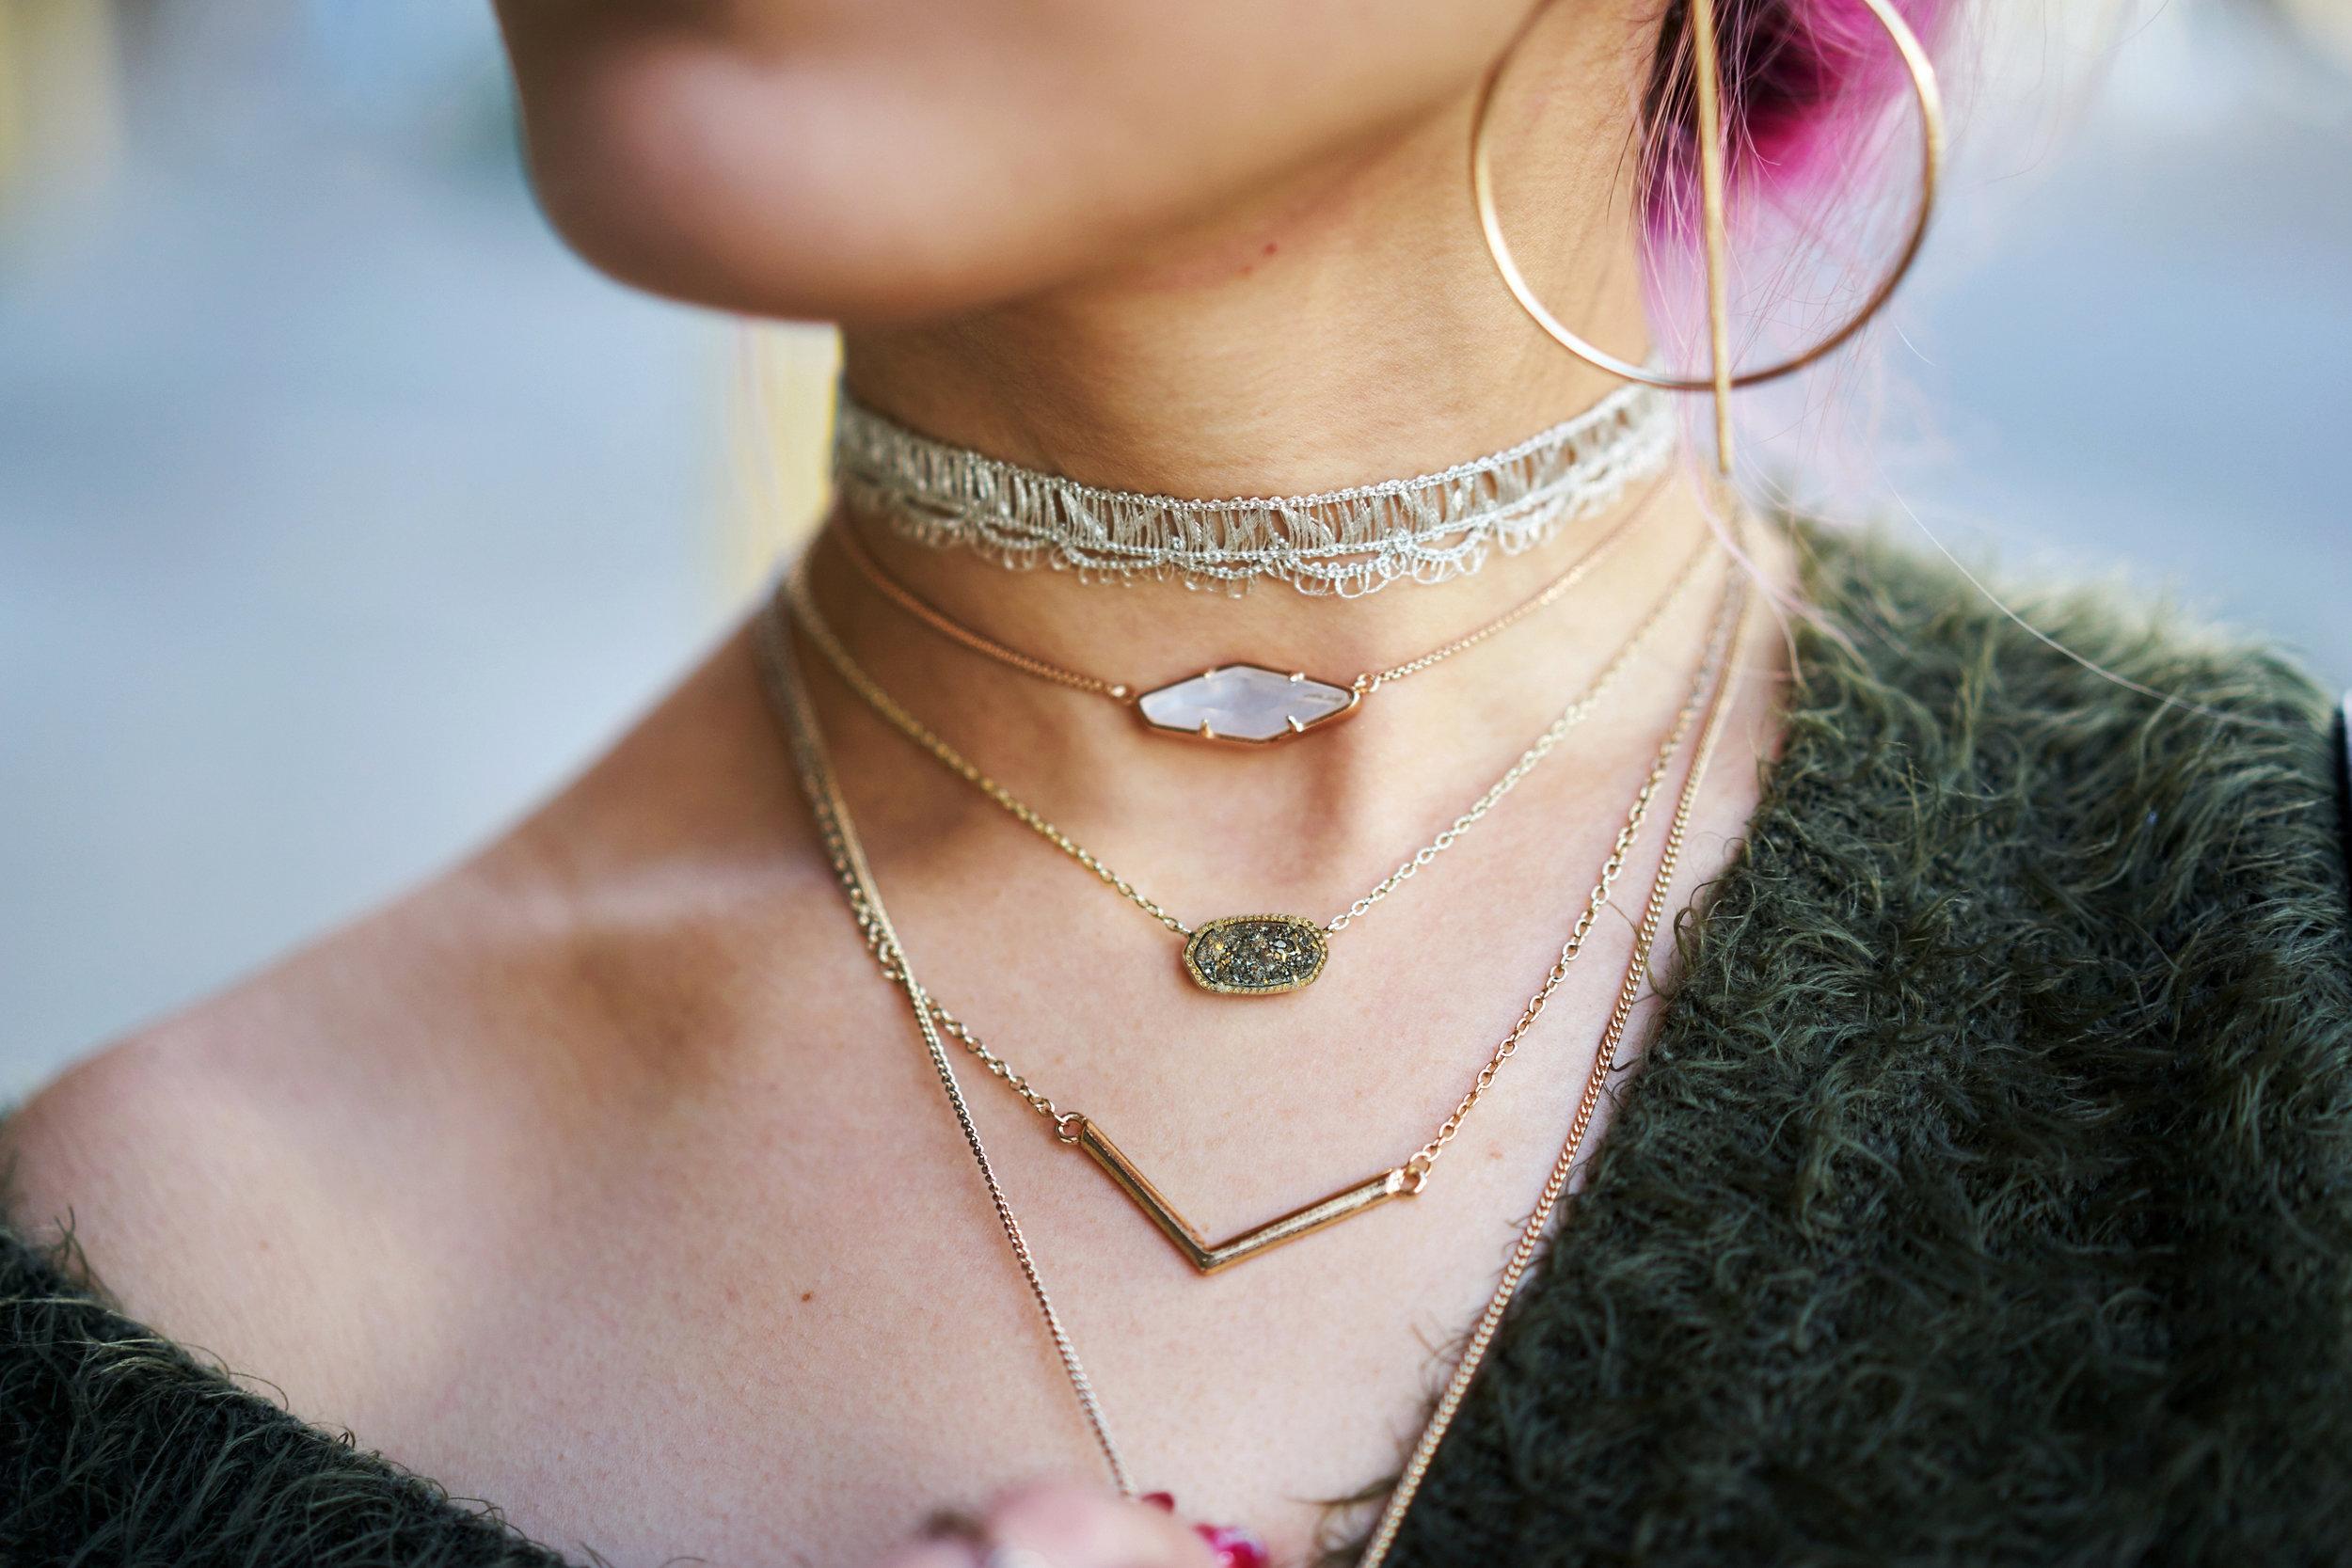 No Weekends Lace Choker-Kendra Scott kendra scott beth necklace & Elisa Pendant Necklace-Mango Earrings_Aika's Love Closet-Seattle Style Blogger-Japanese 3